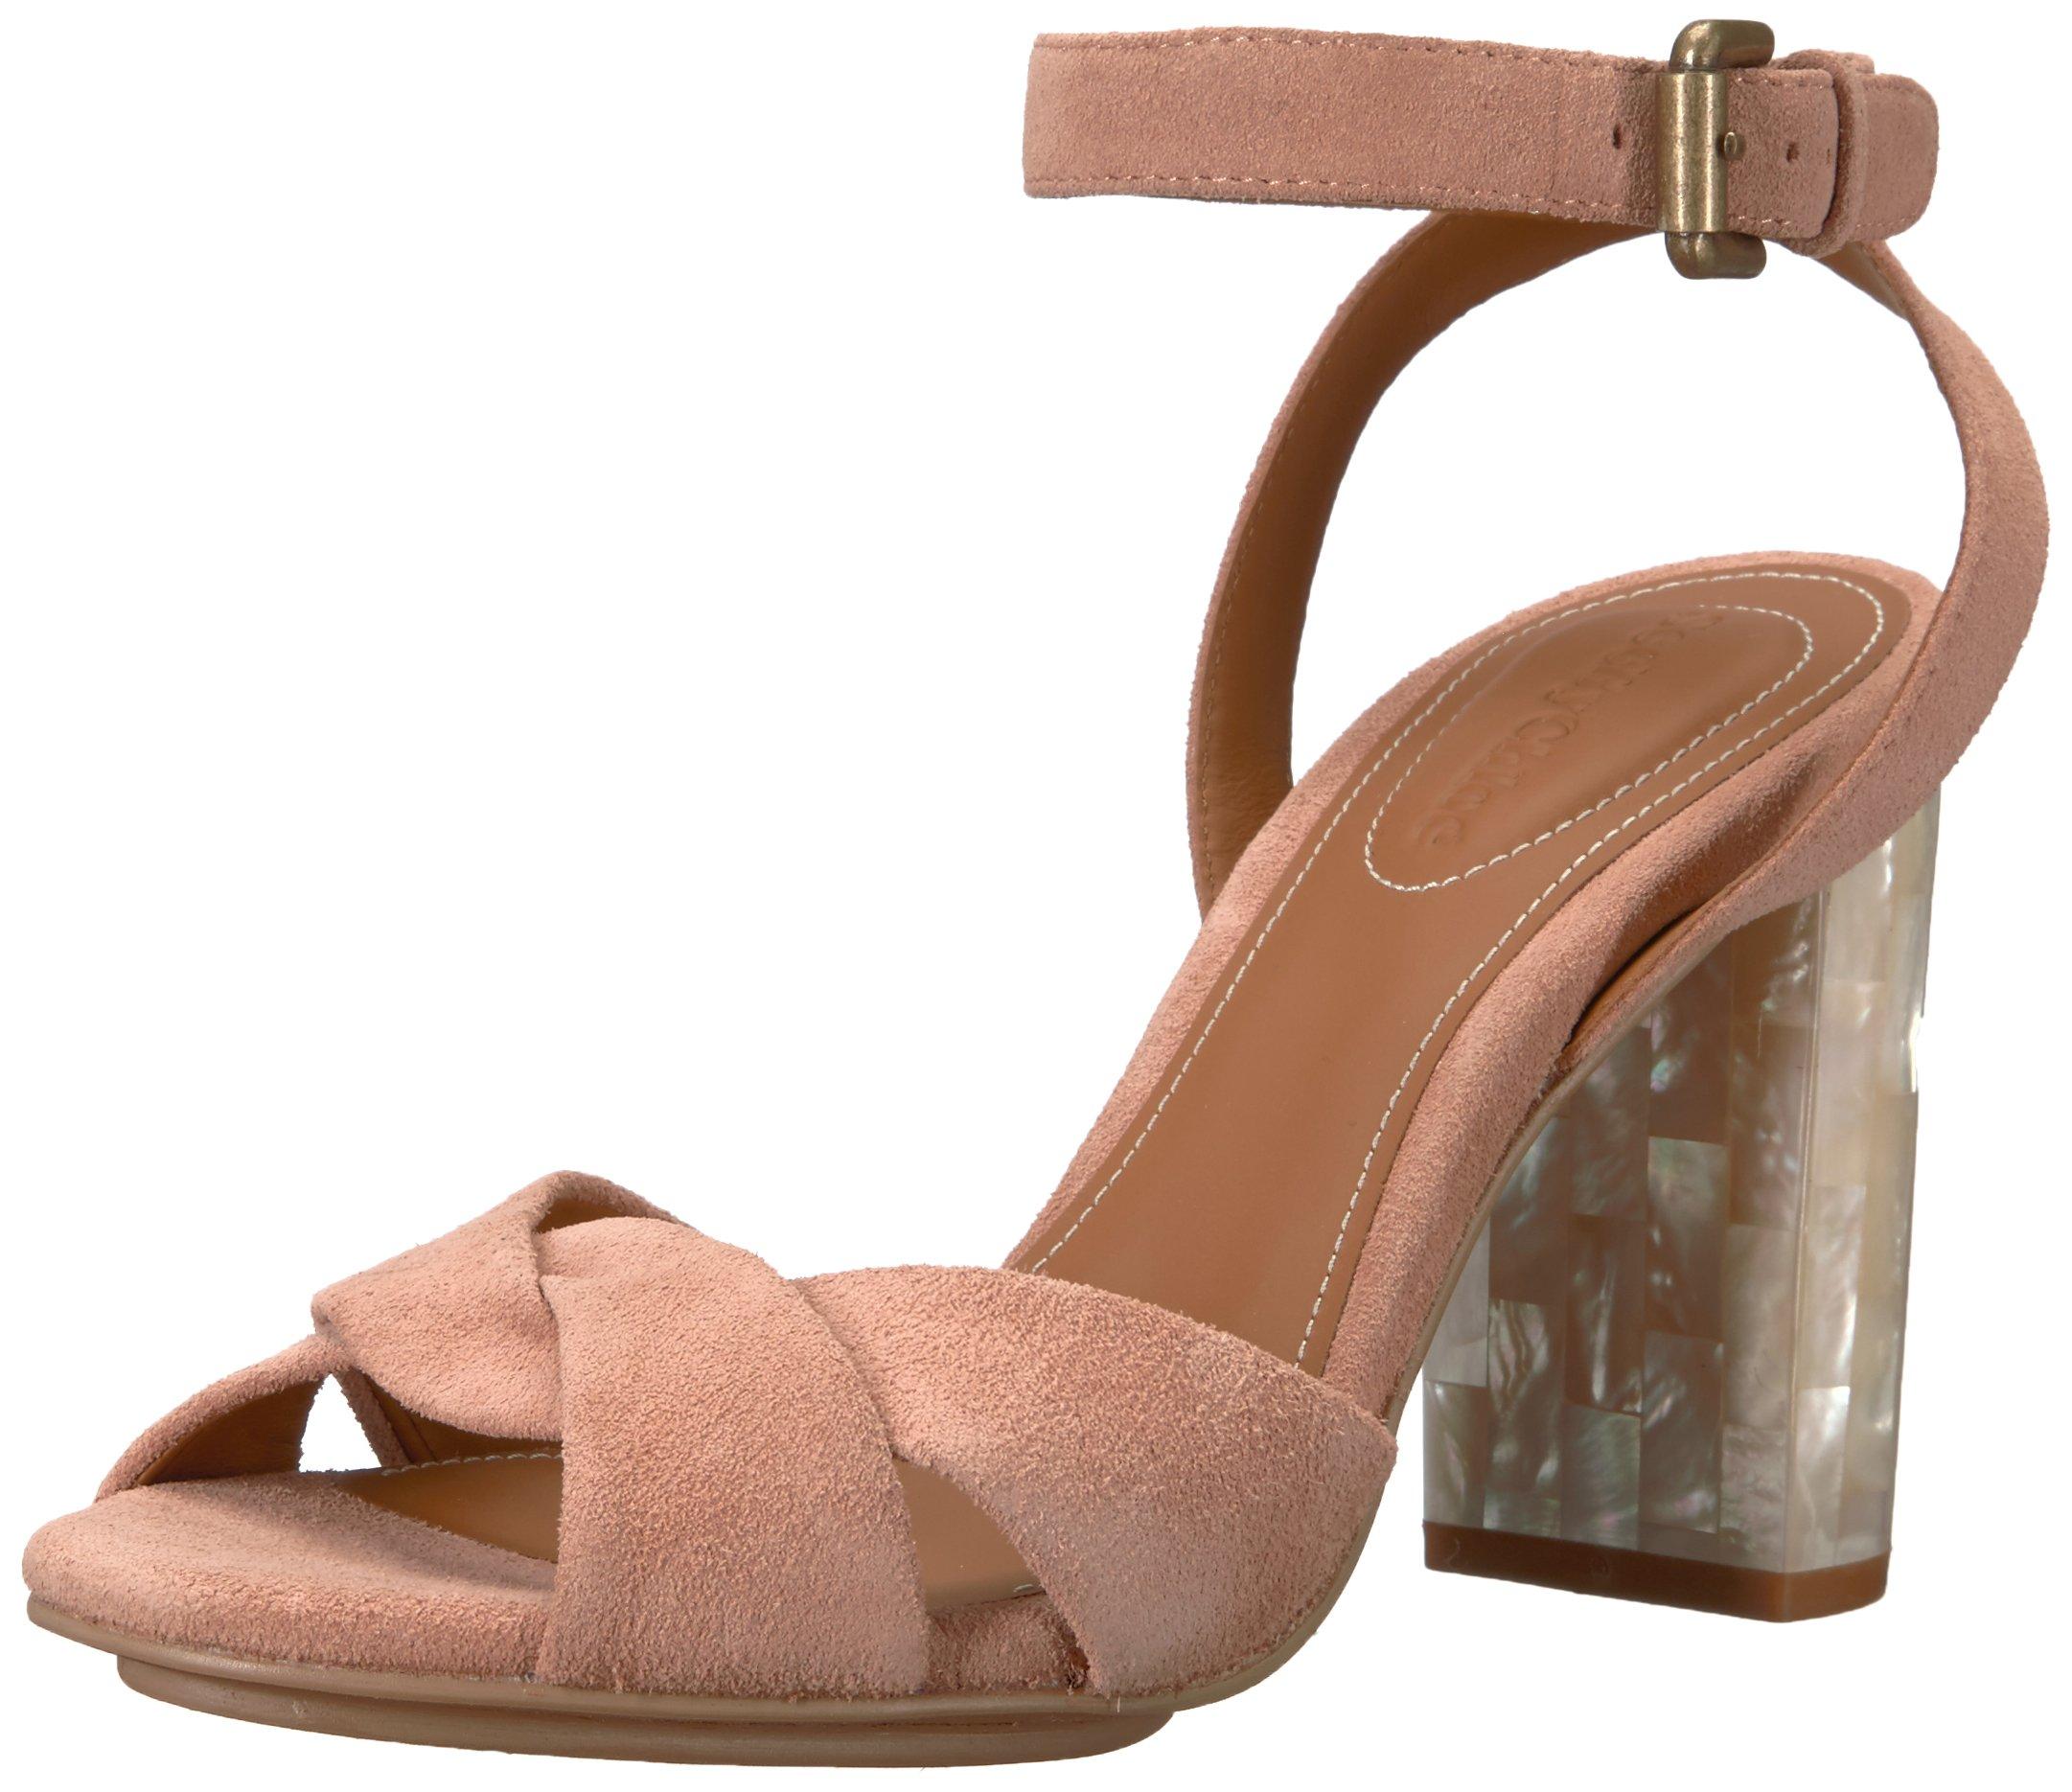 See By Chloe Women's Isida Suede Heeled Sandal, Light/Pastel Pink, 37.5 M EU (7.5 US)